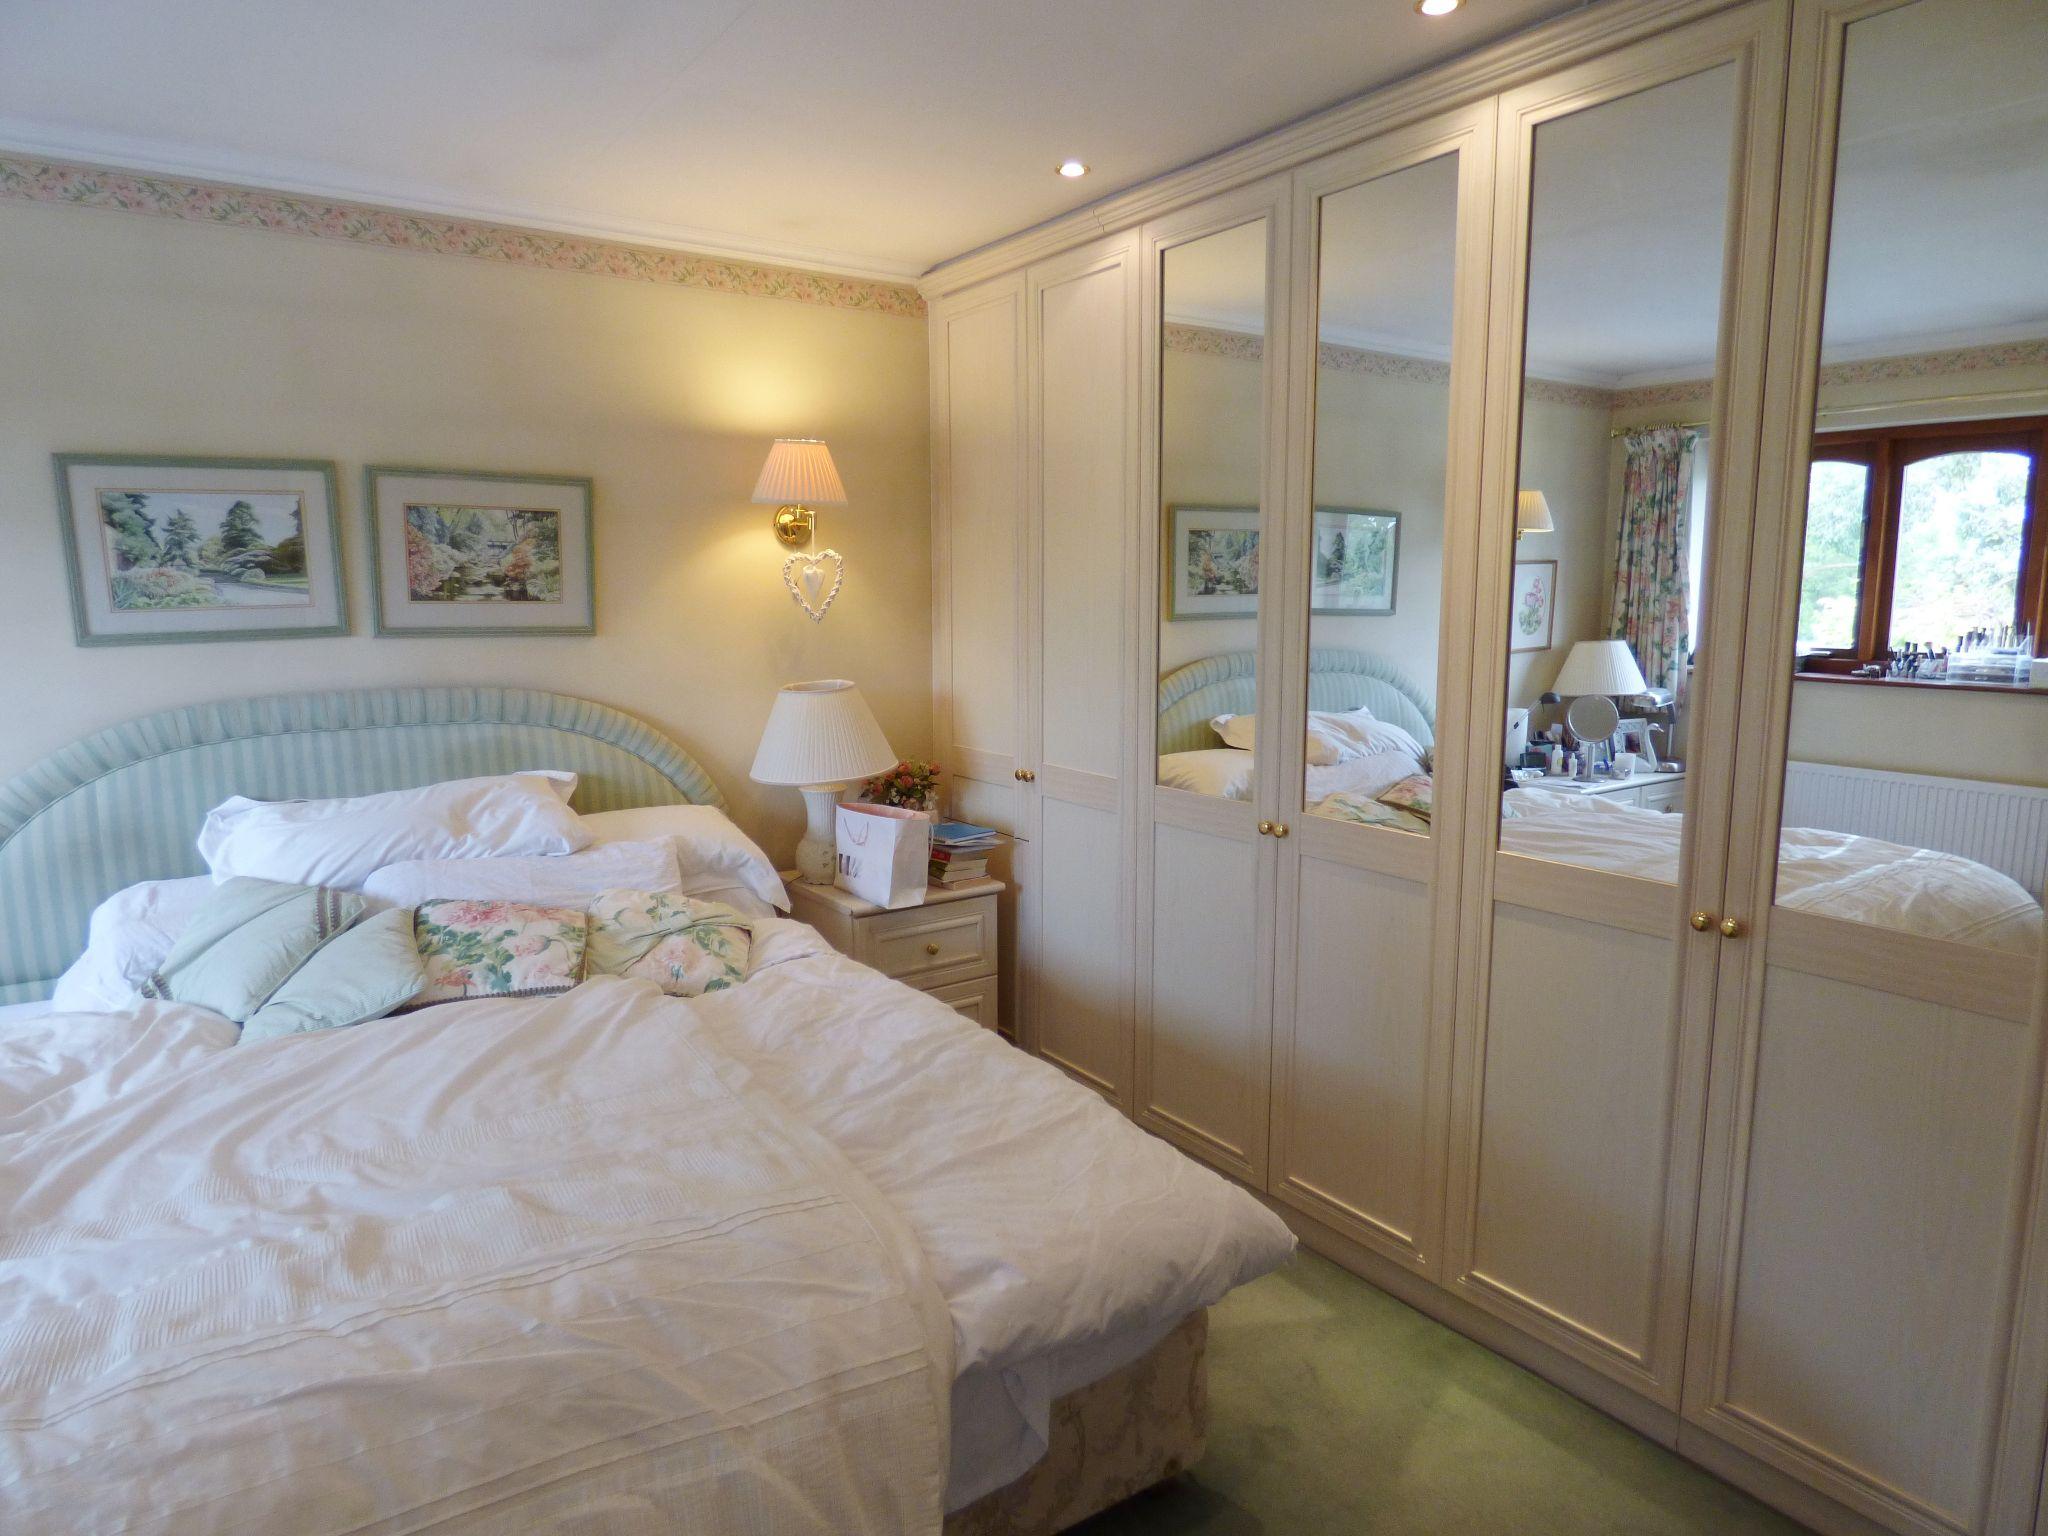 4 Bedroom Detached House For Sale - Bedroom One